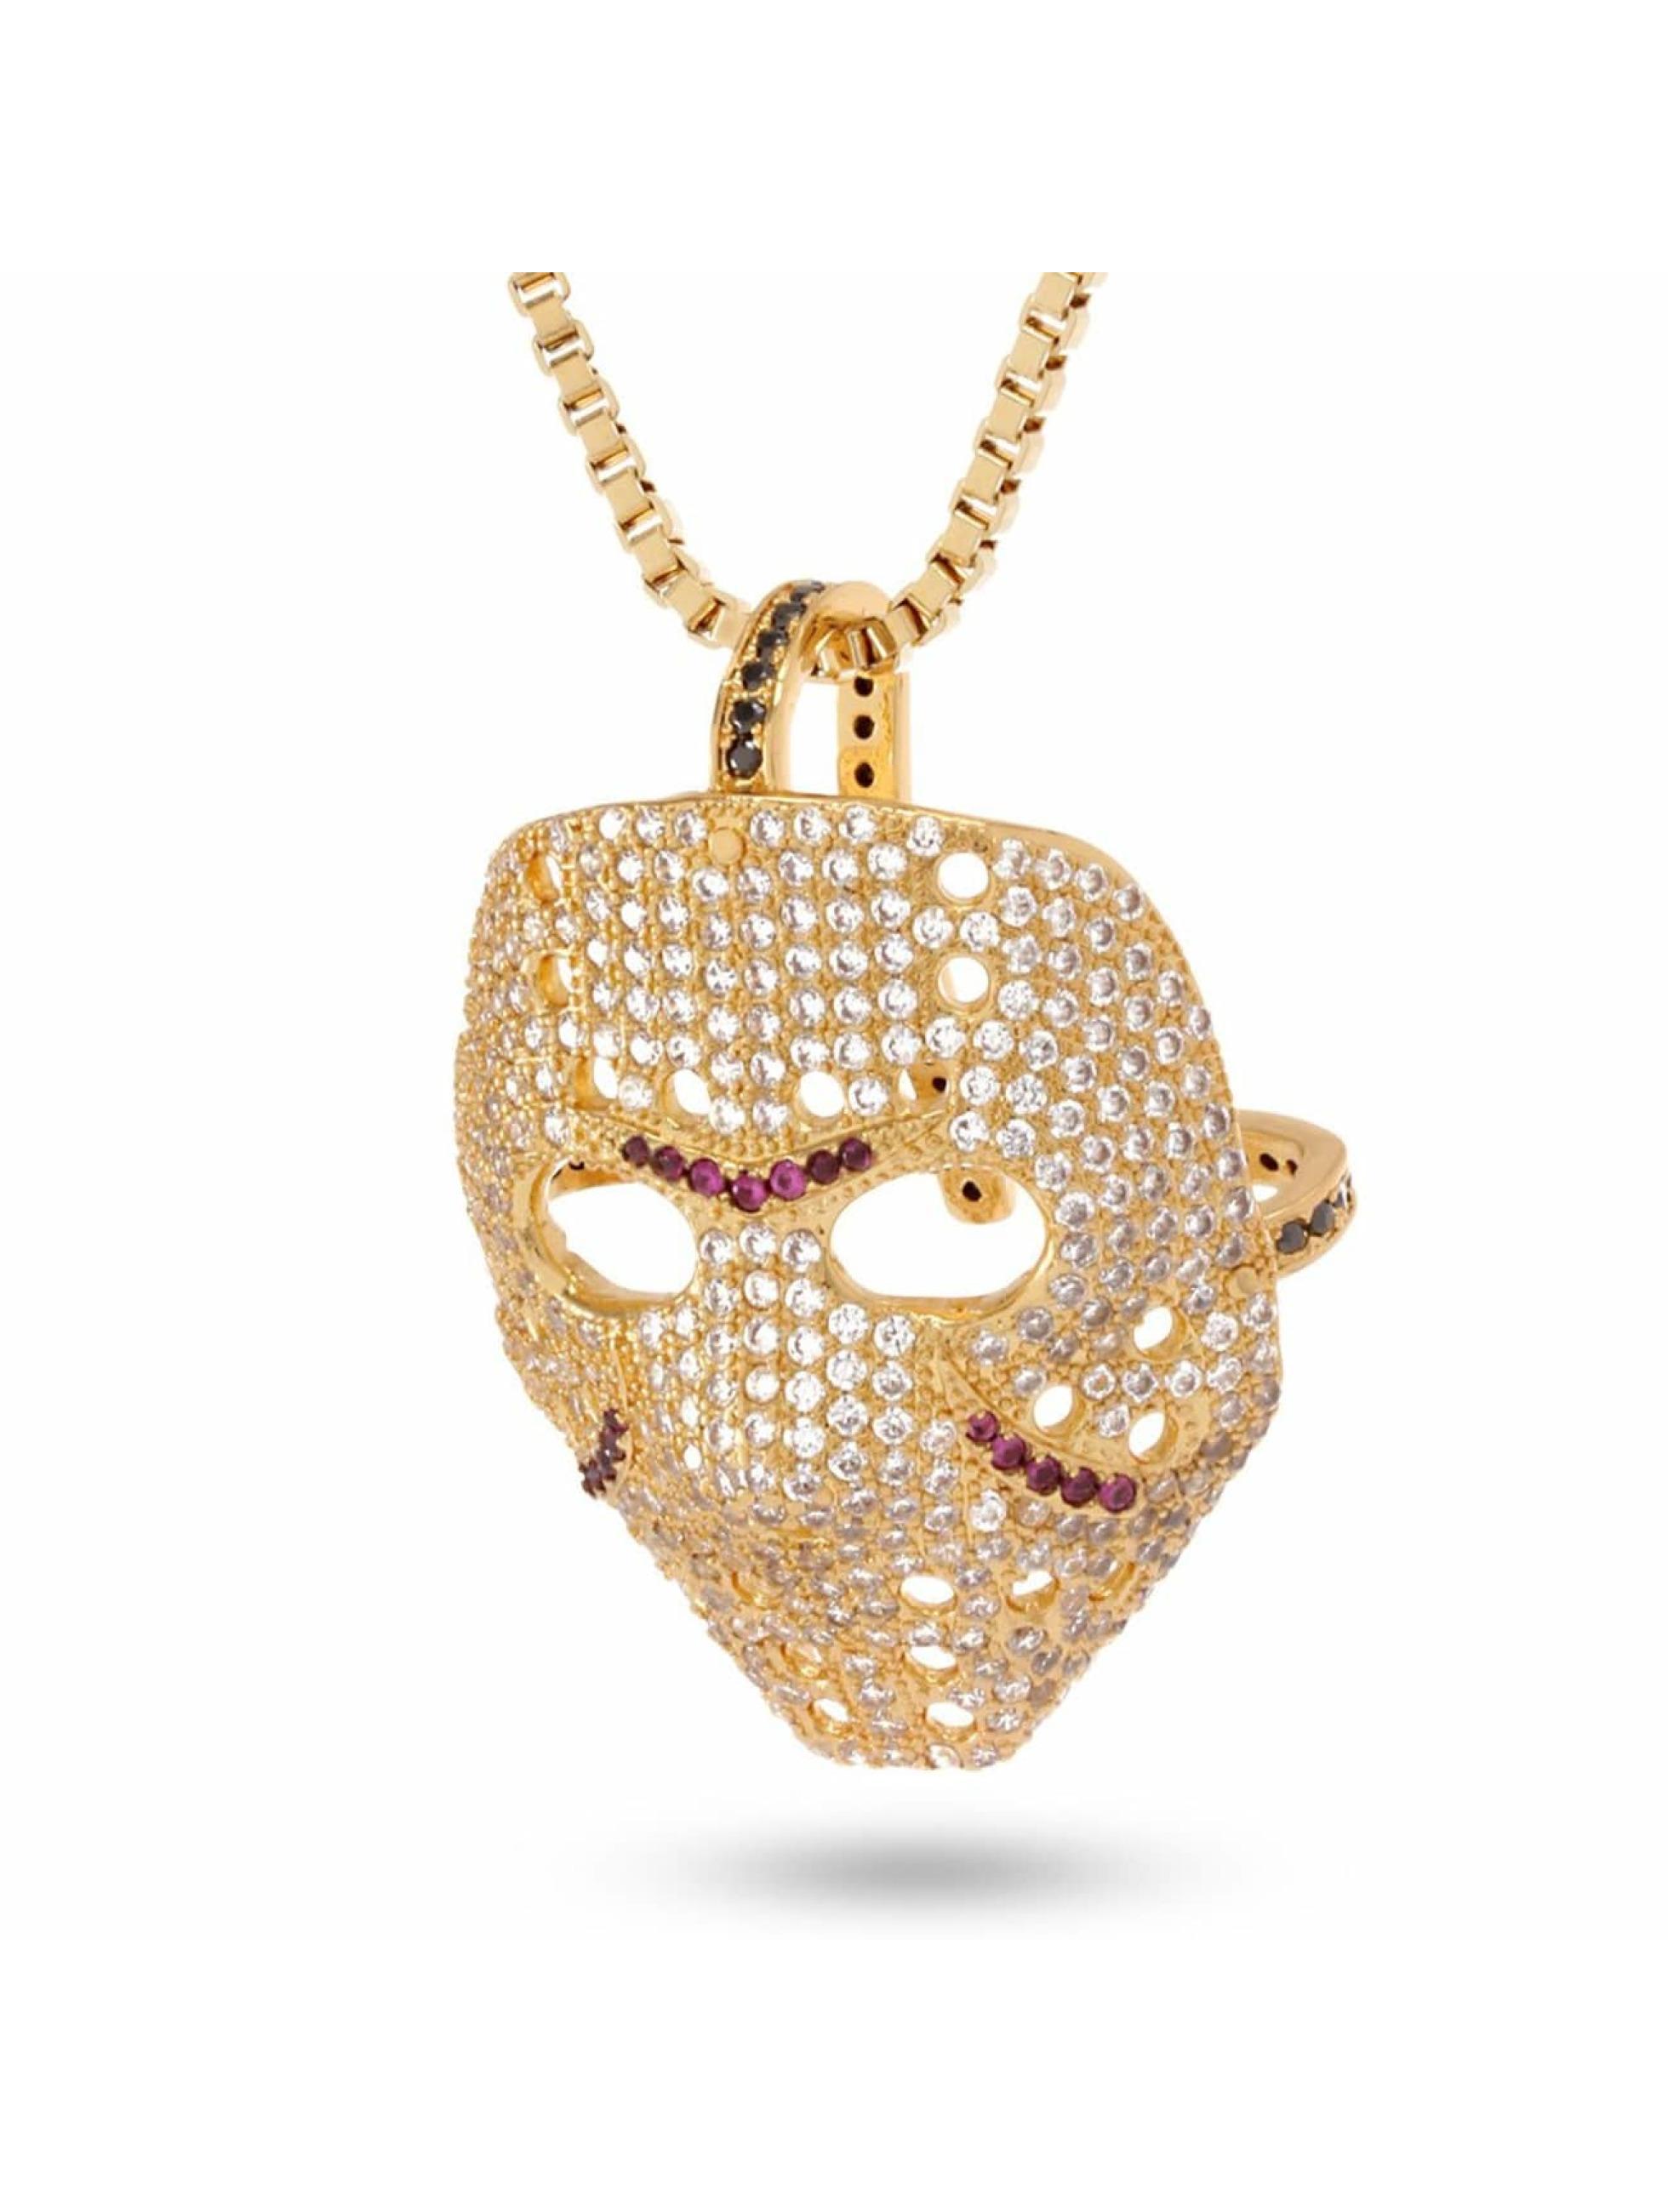 KING ICE Цепочка Small Hockey Mask золото